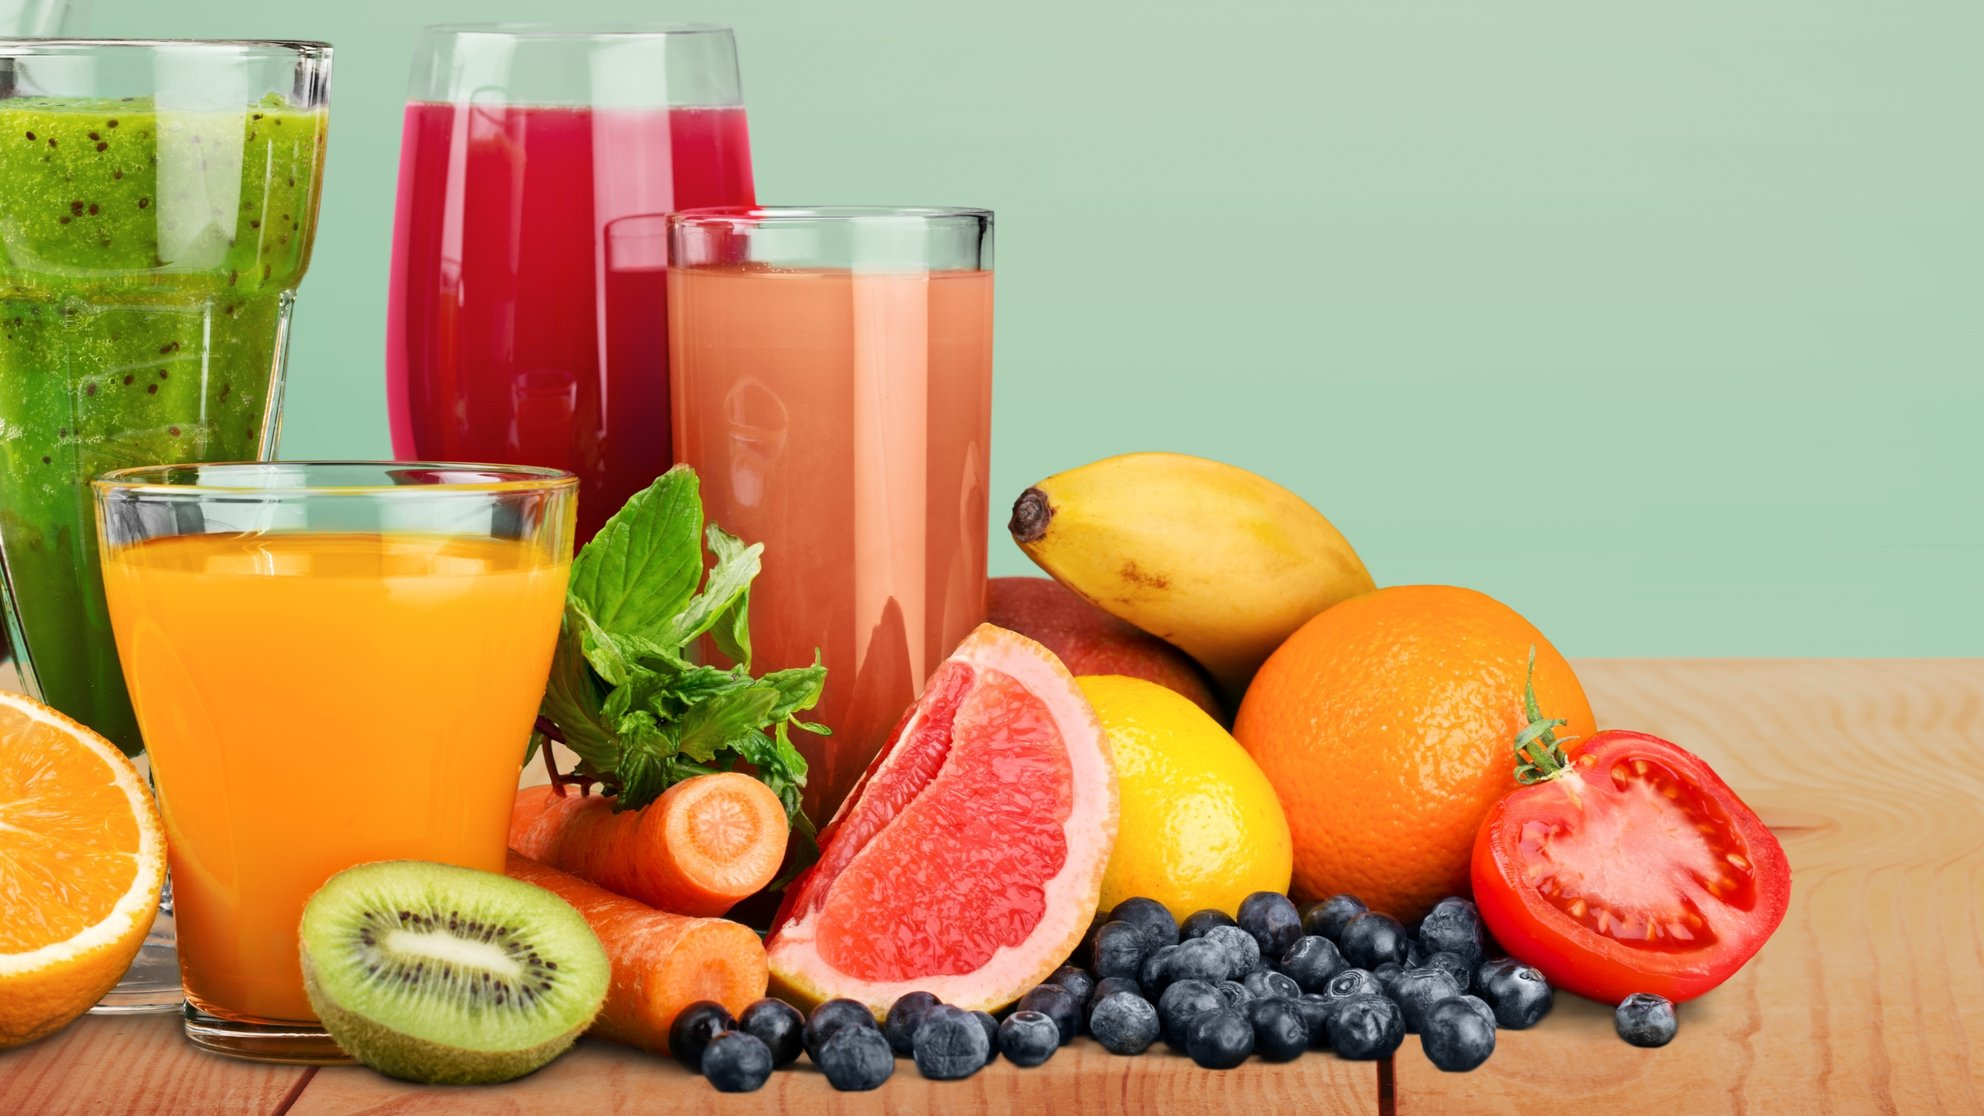 vitamin c in different fruit juice And vitamin c content of pawpaw juice  ascorbic acid content (mg/100 ml) of different fruit juice samples s/n sample code zero week first week second.